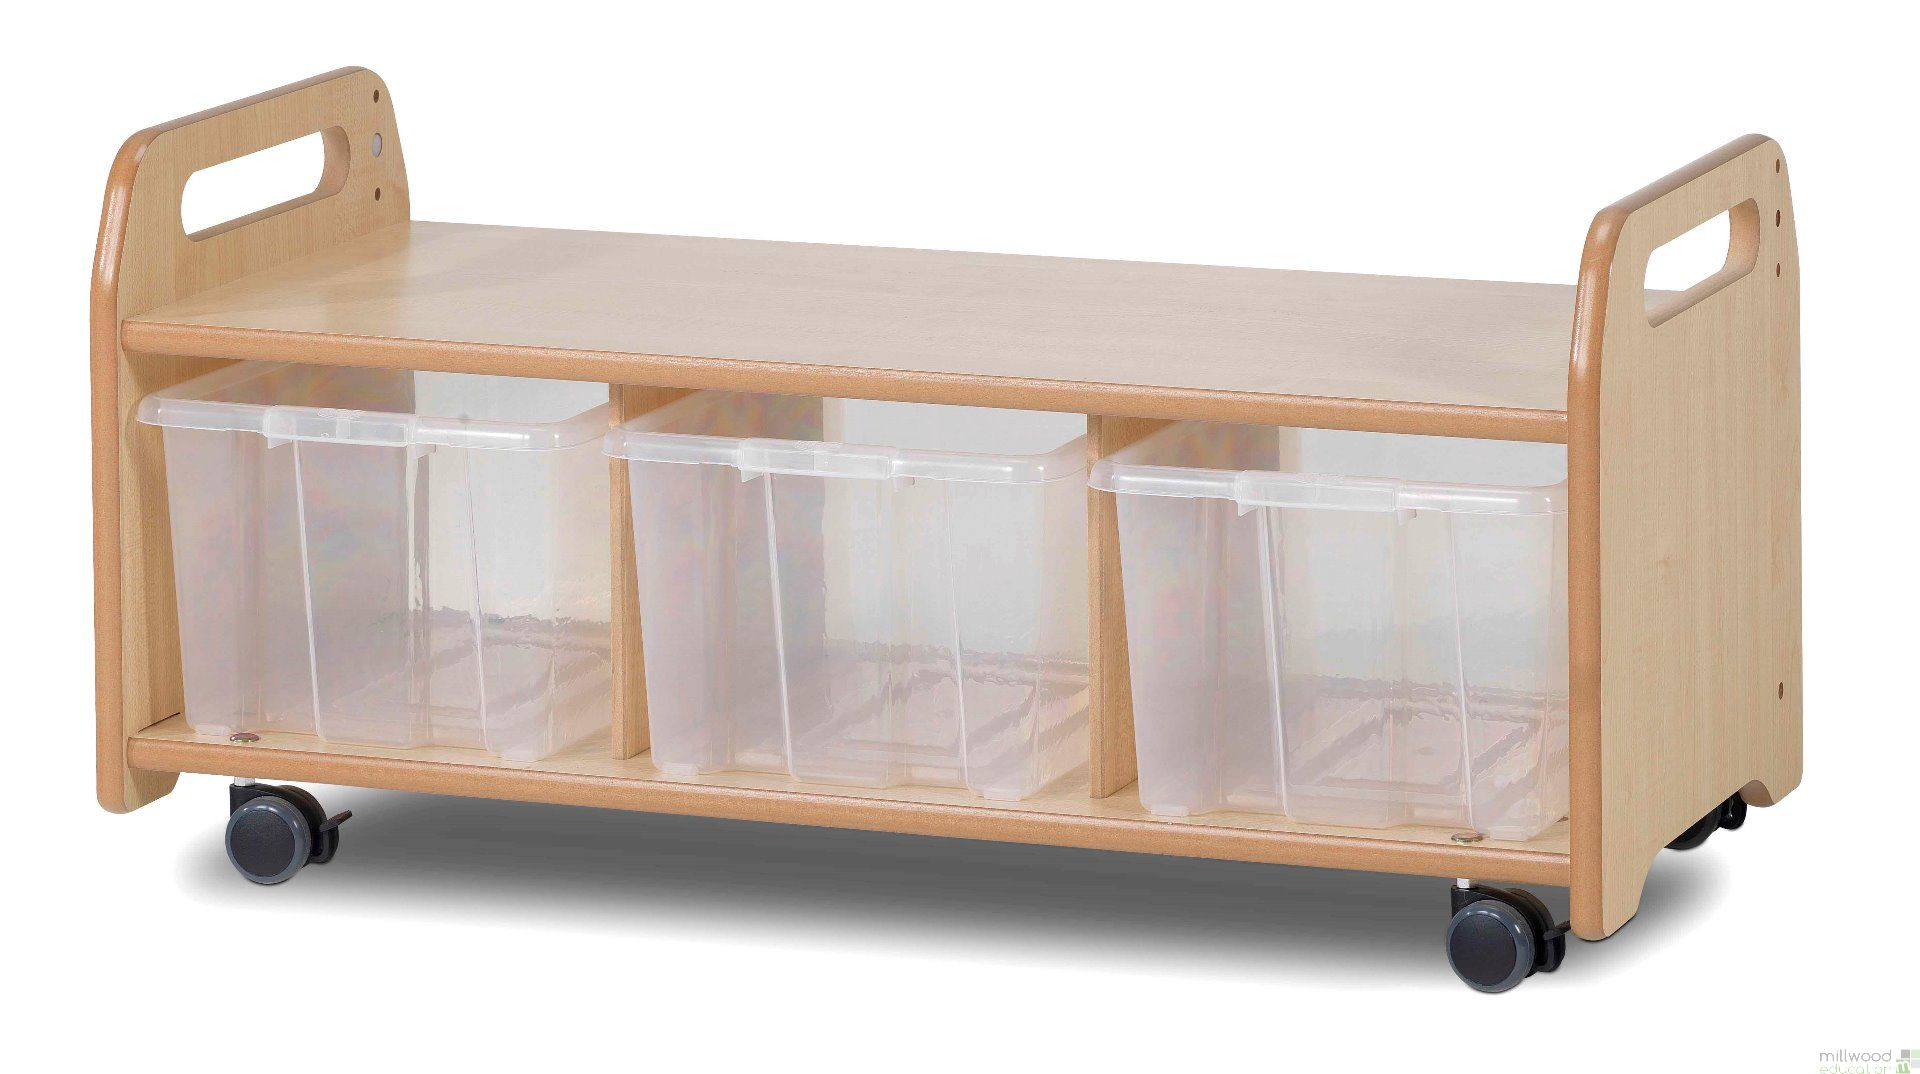 Prime Low Level Storage Bench With Tubs Castors Uwap Interior Chair Design Uwaporg